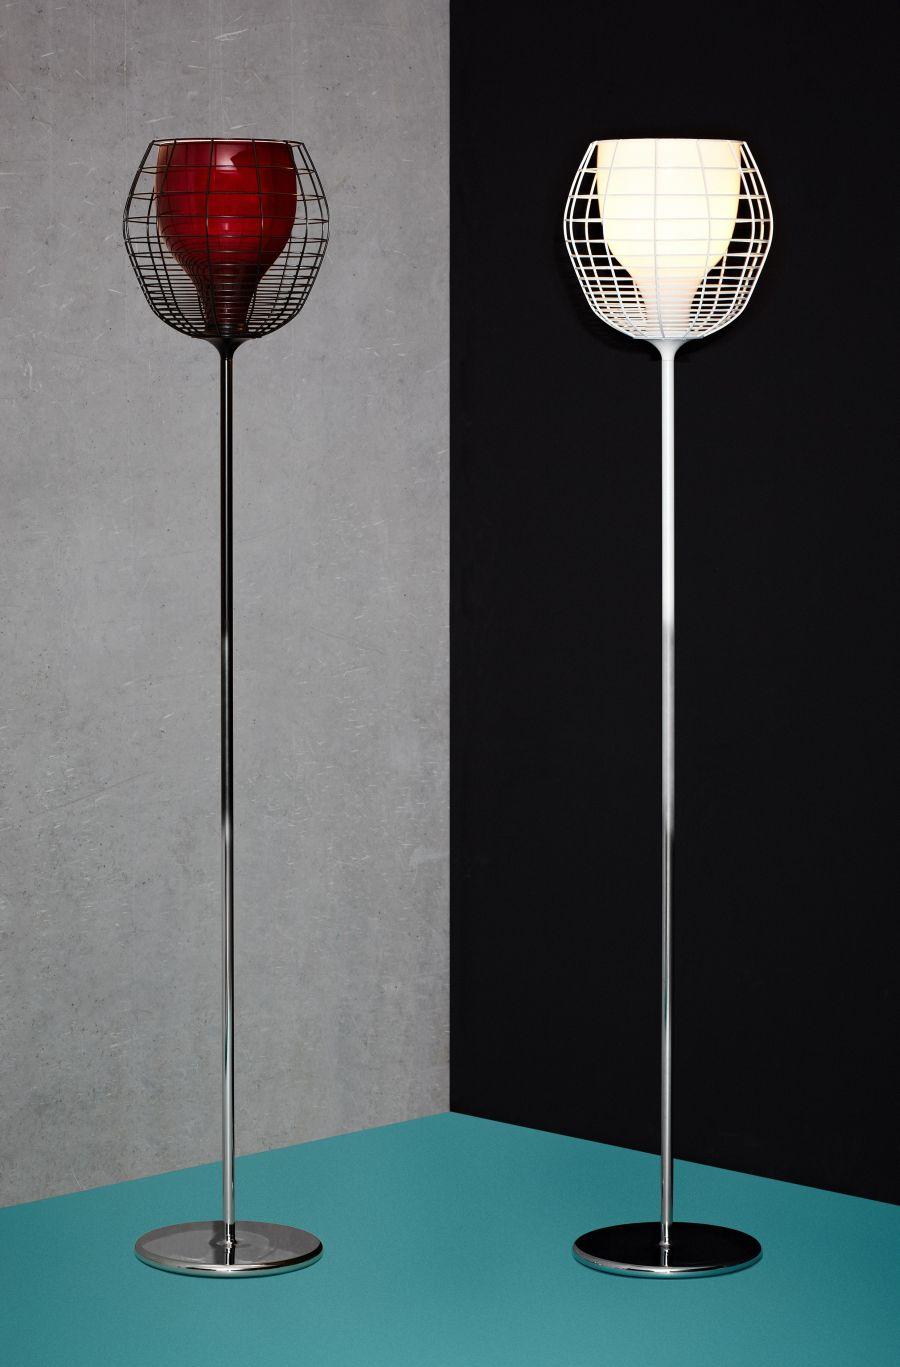 gulv-lamper-ikea-farve